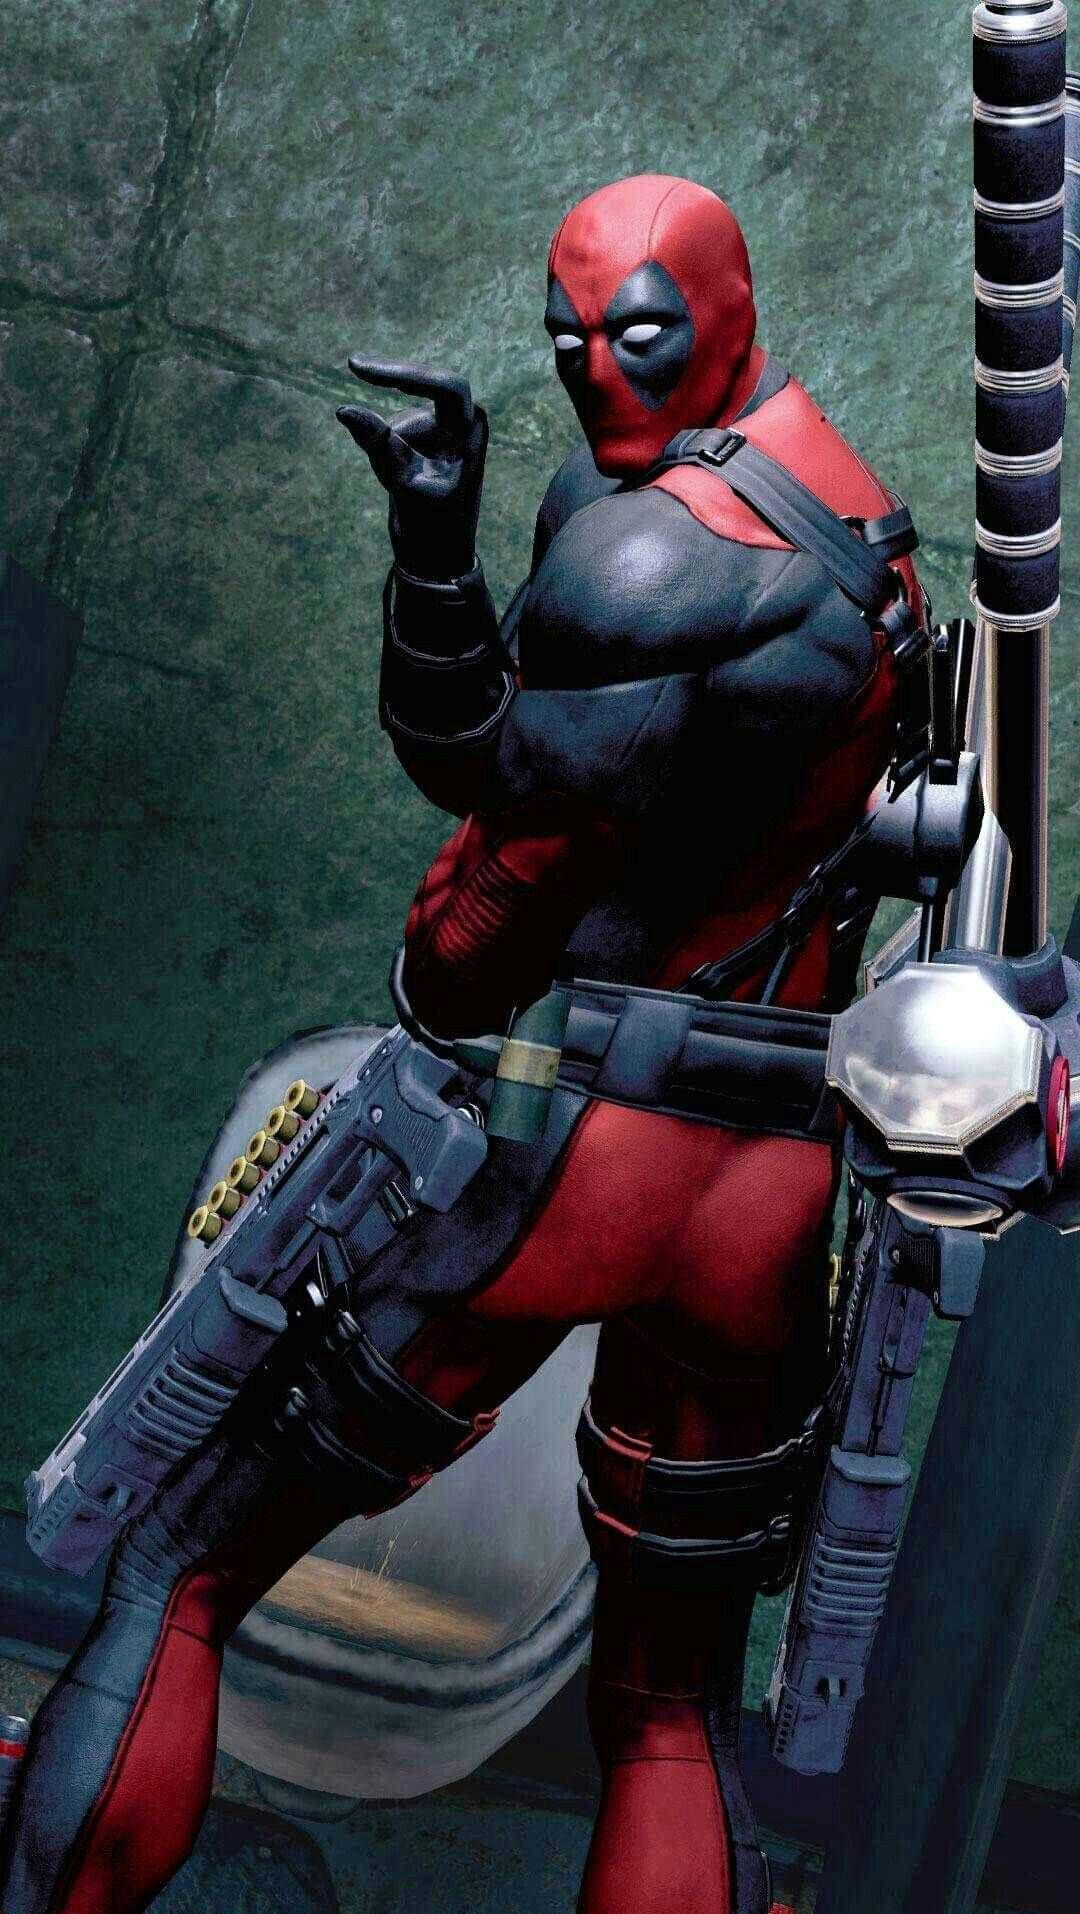 New Deadpool Pee In The Toilet Iphone Em 2020 Vingadores Fan Art Hd 1080p